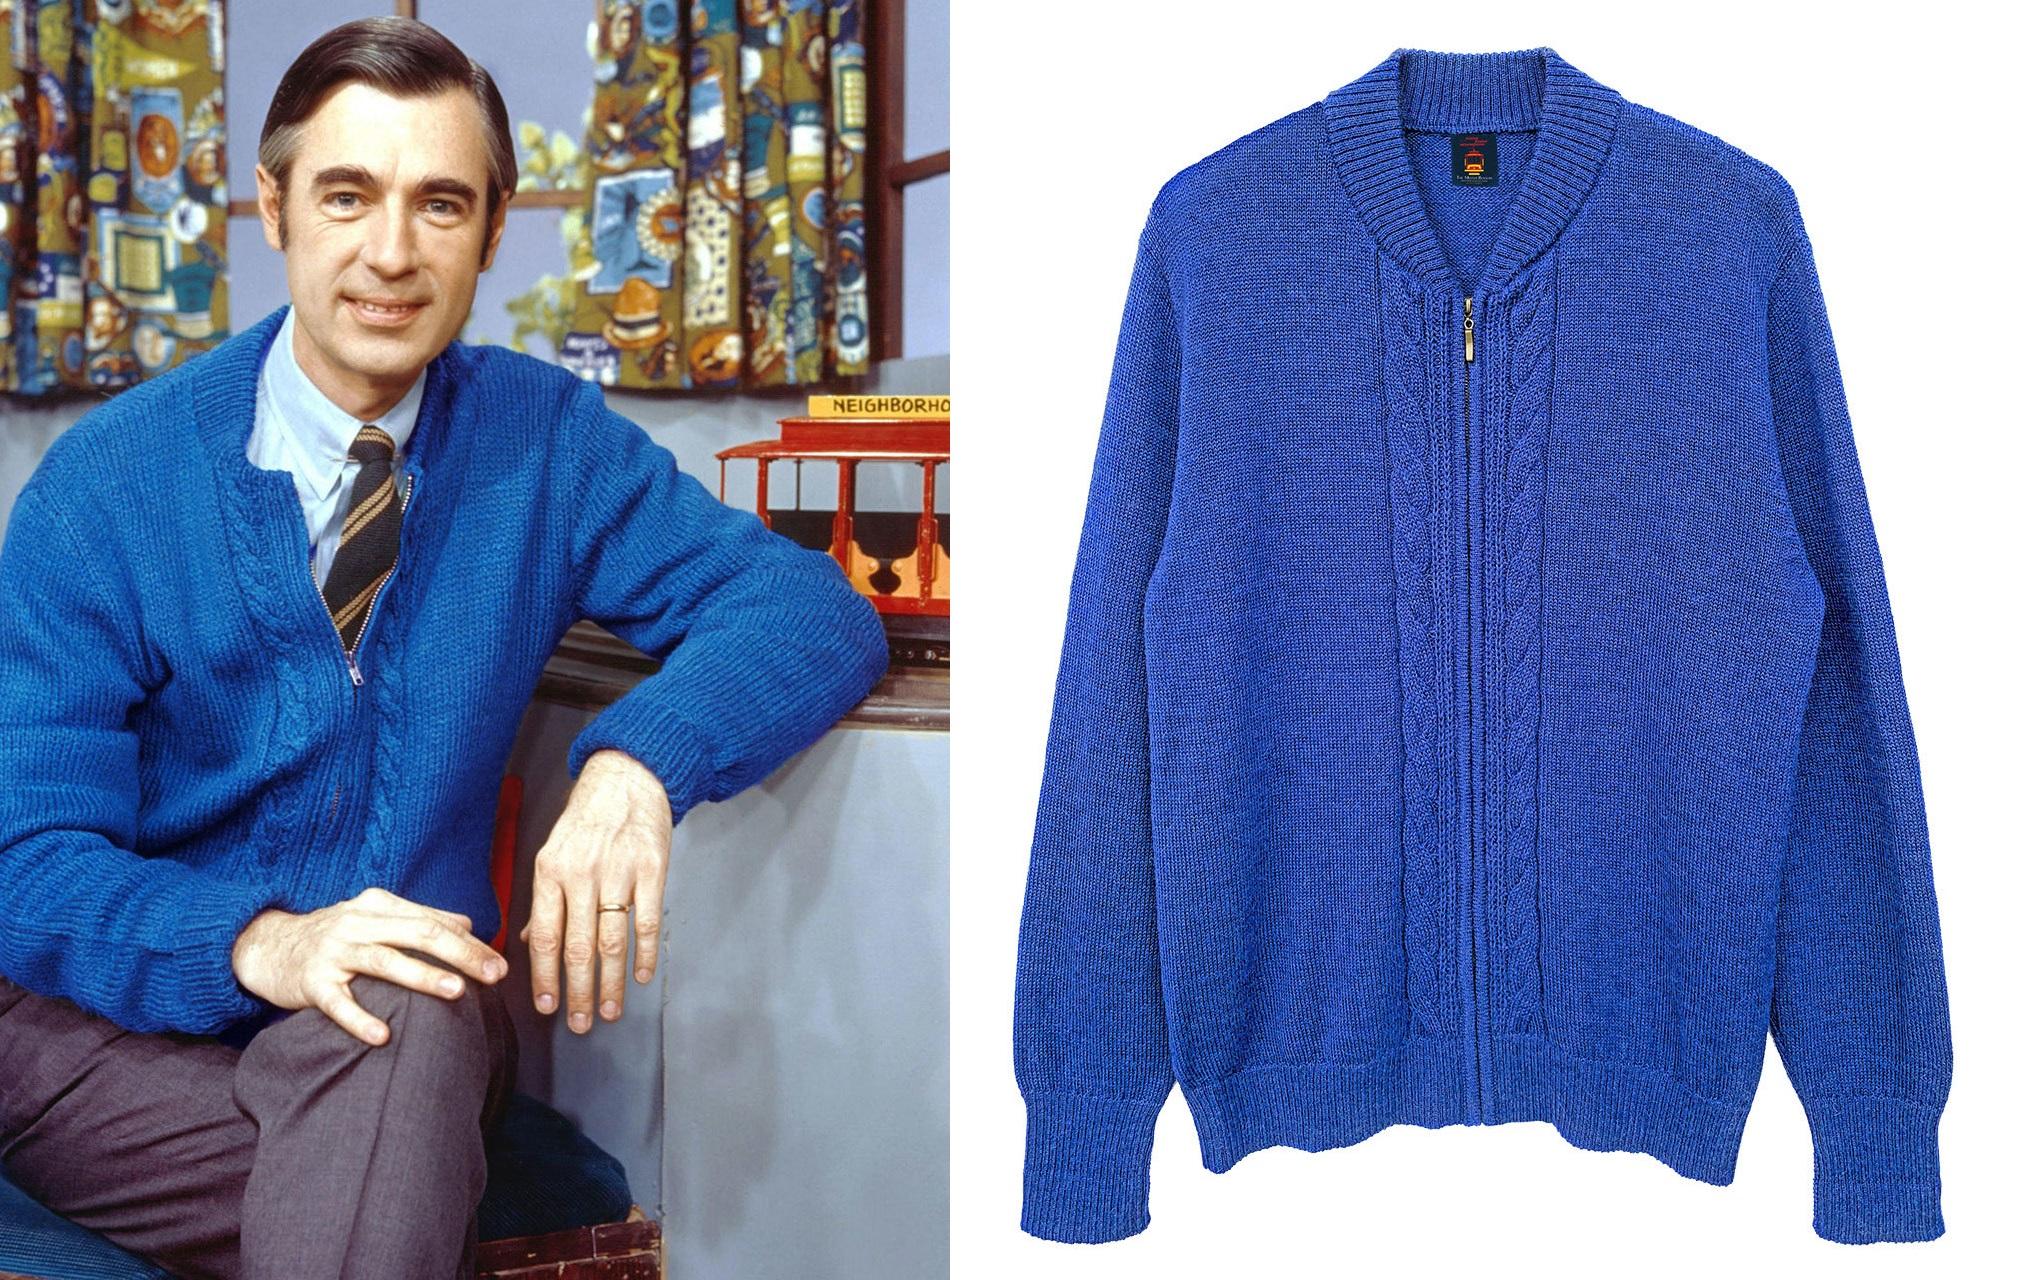 Mr.-Rogers-Blue-Sweater